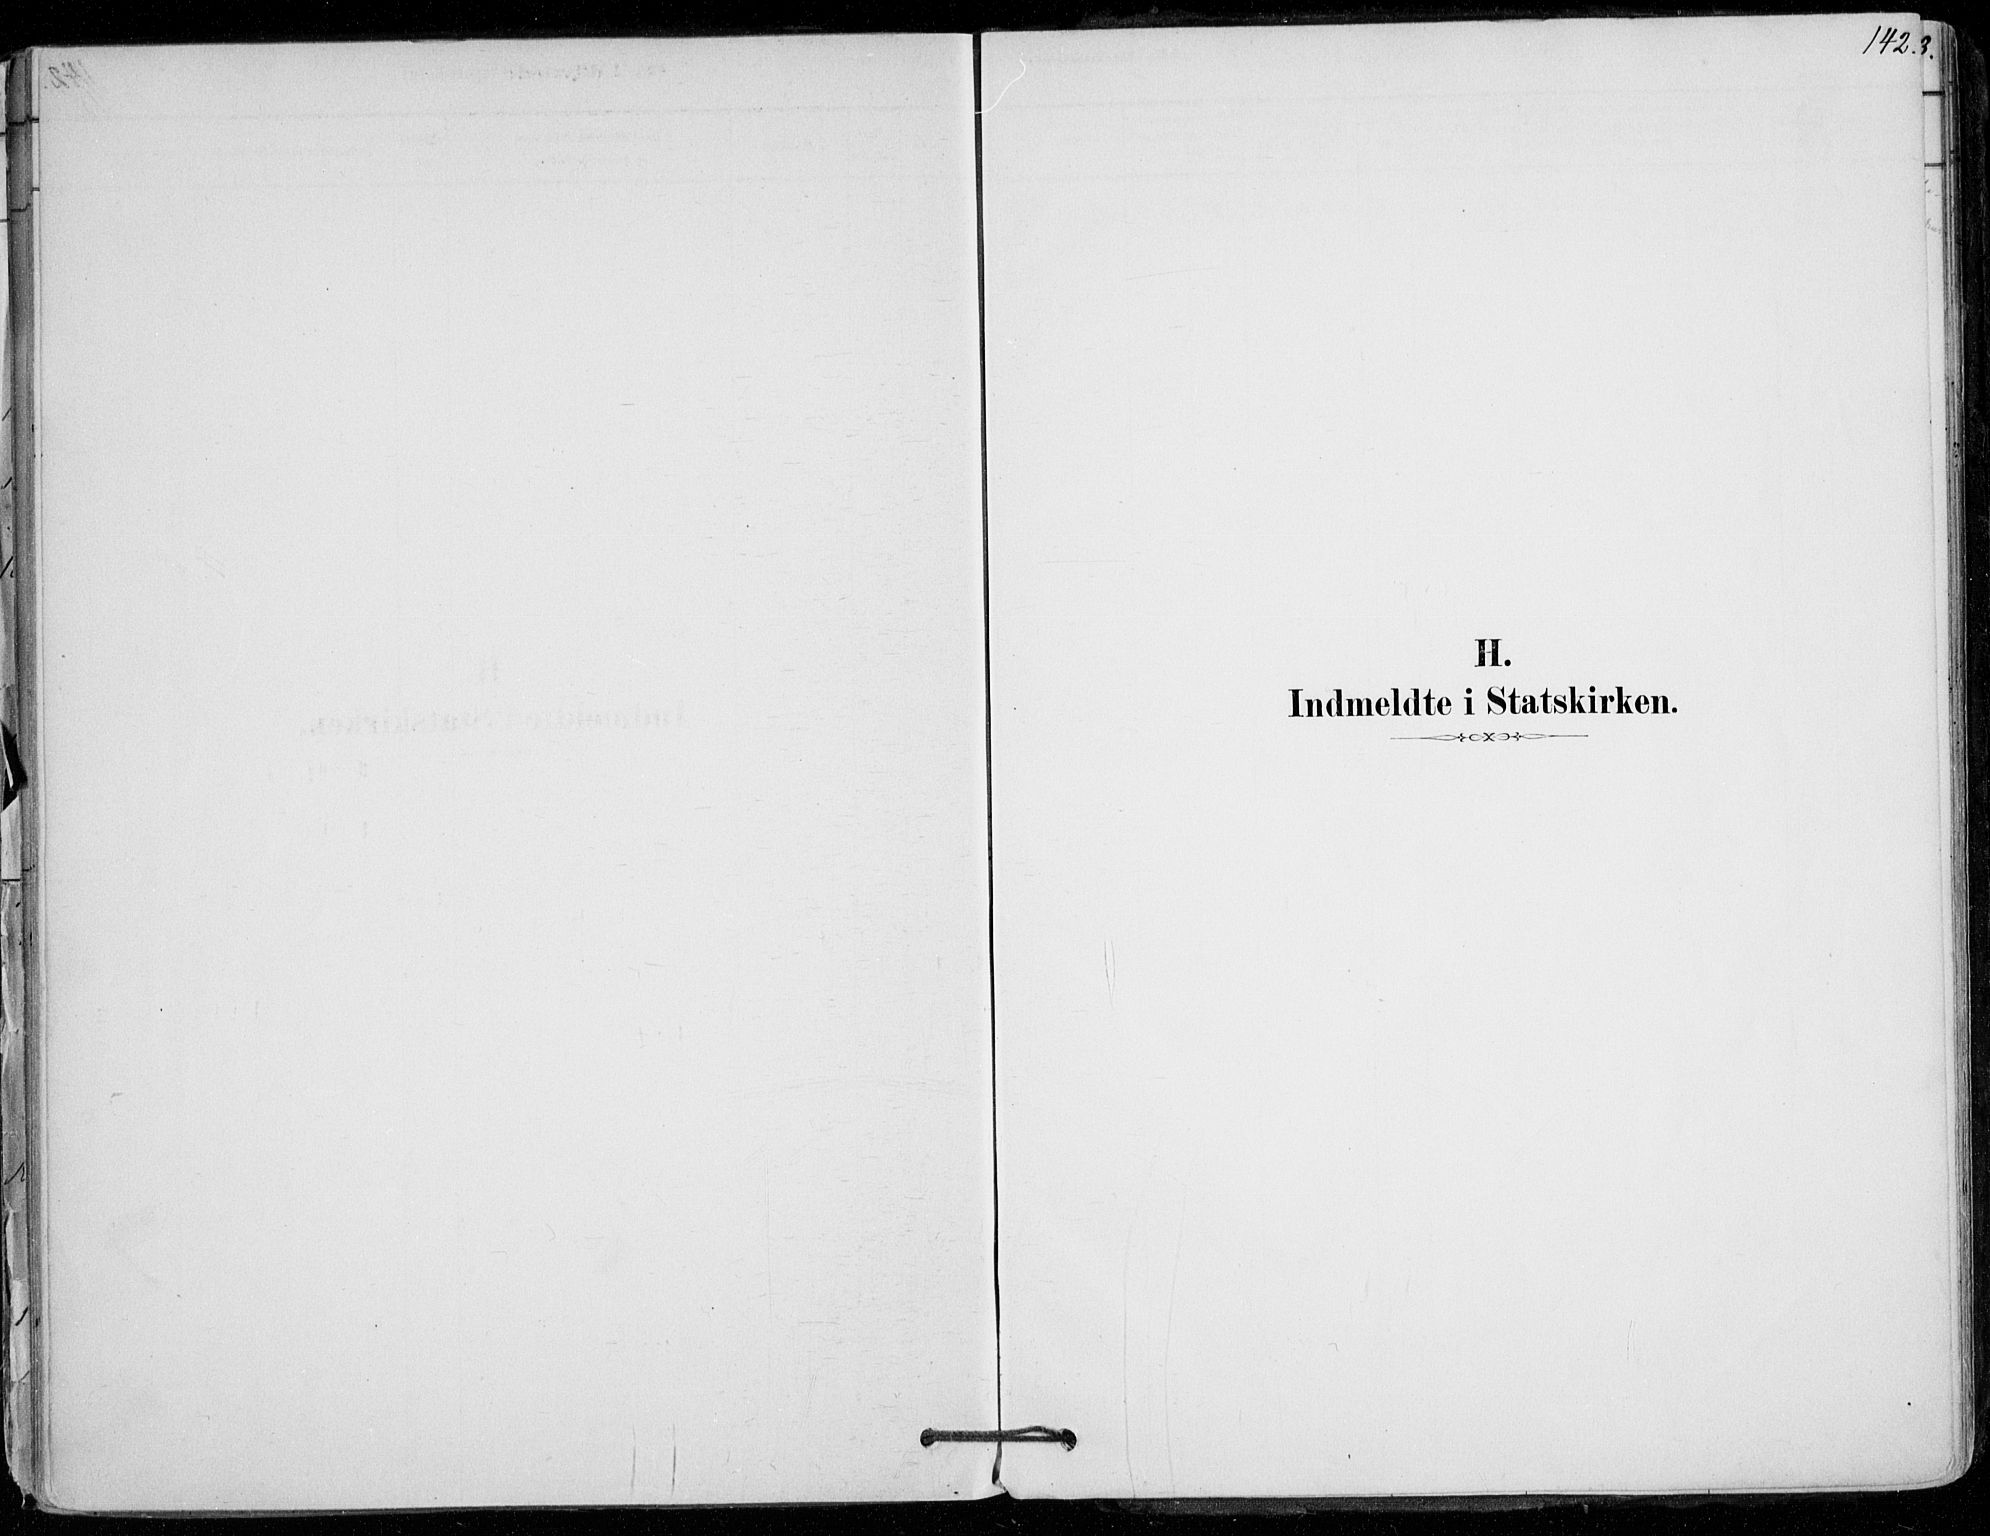 SAO, Vestby prestekontor Kirkebøker, F/Fd/L0001: Ministerialbok nr. IV 1, 1878-1945, s. 142